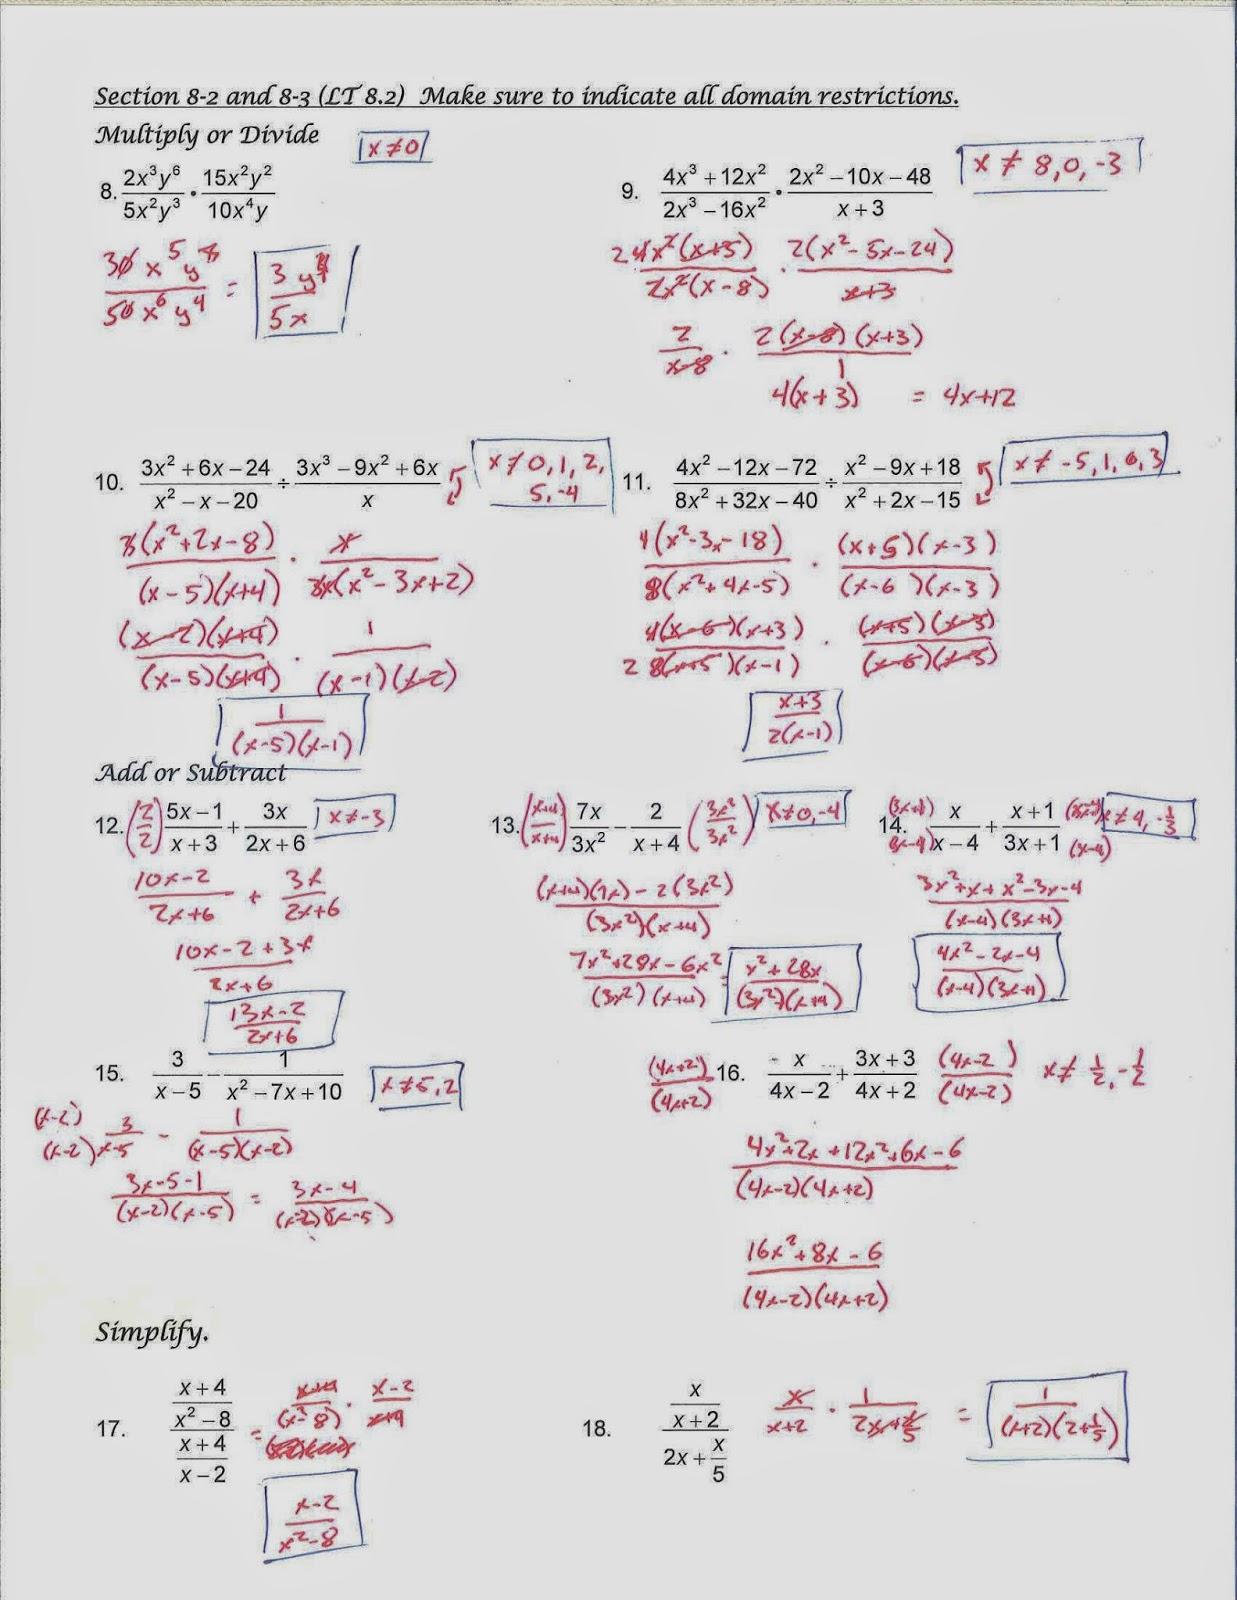 mr  doran u0026 39 s algebra 2  unit 6 exam review materials